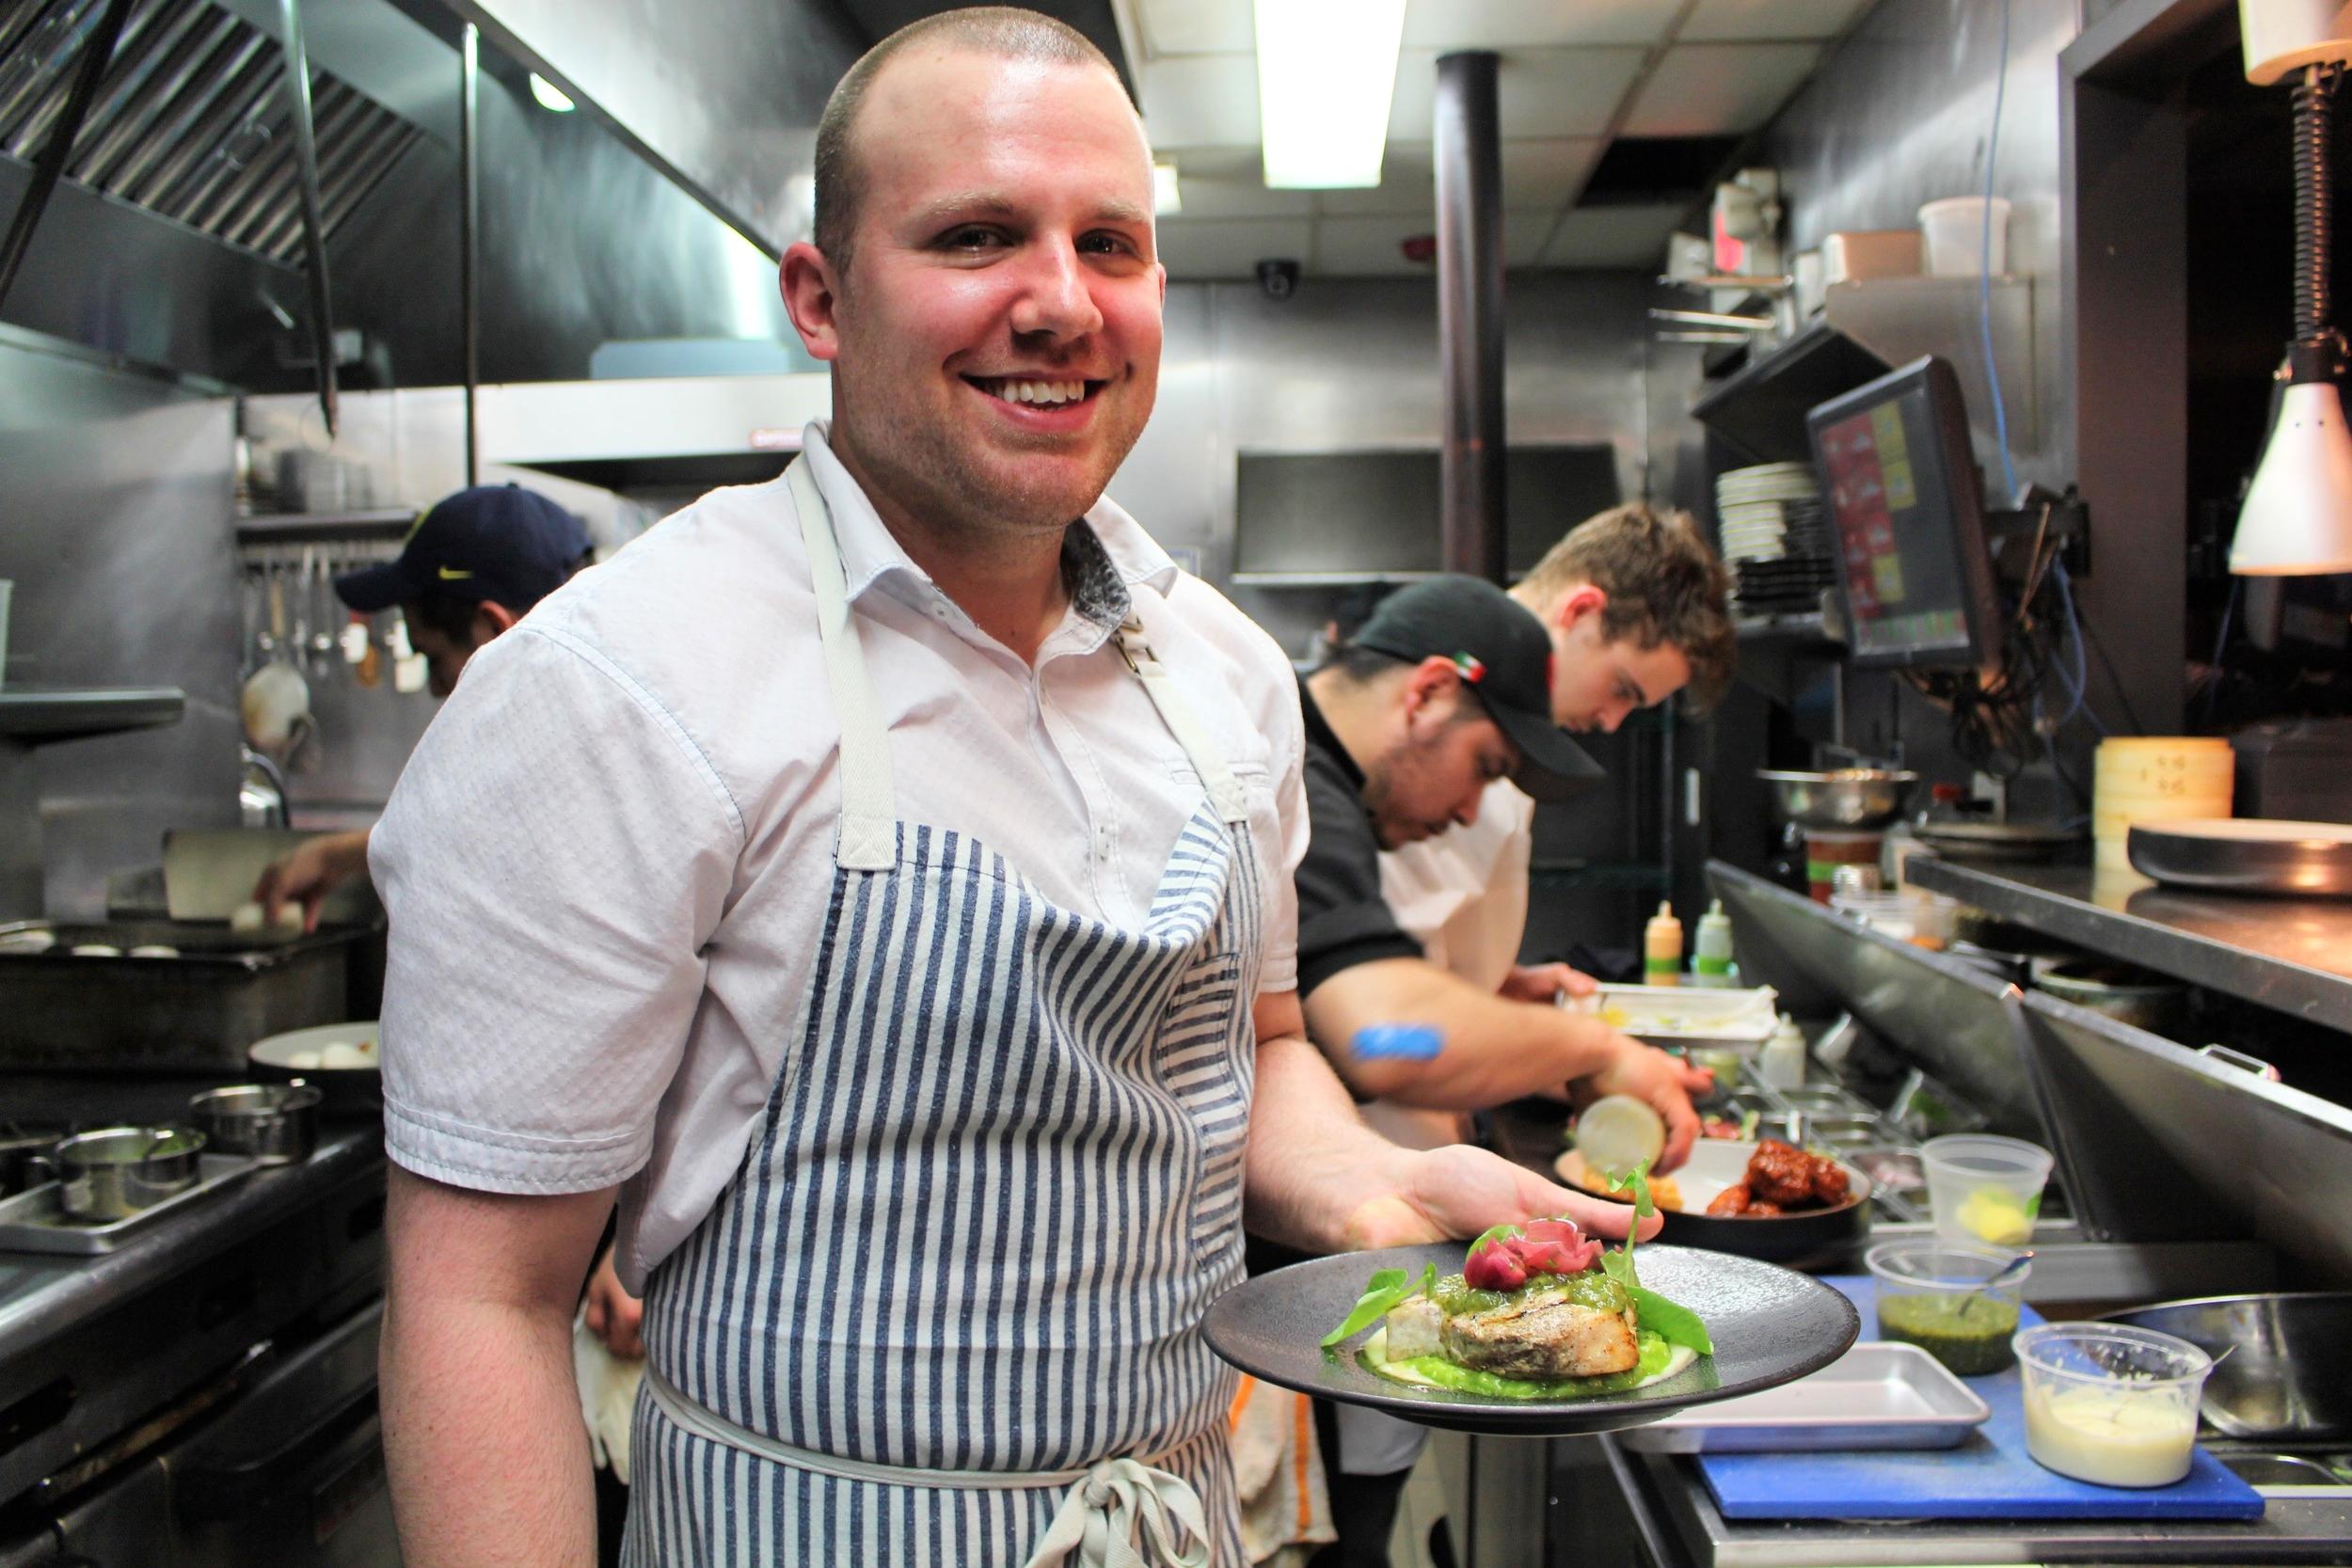 The man, the myth, the legend - Chef Ryan Ratino.